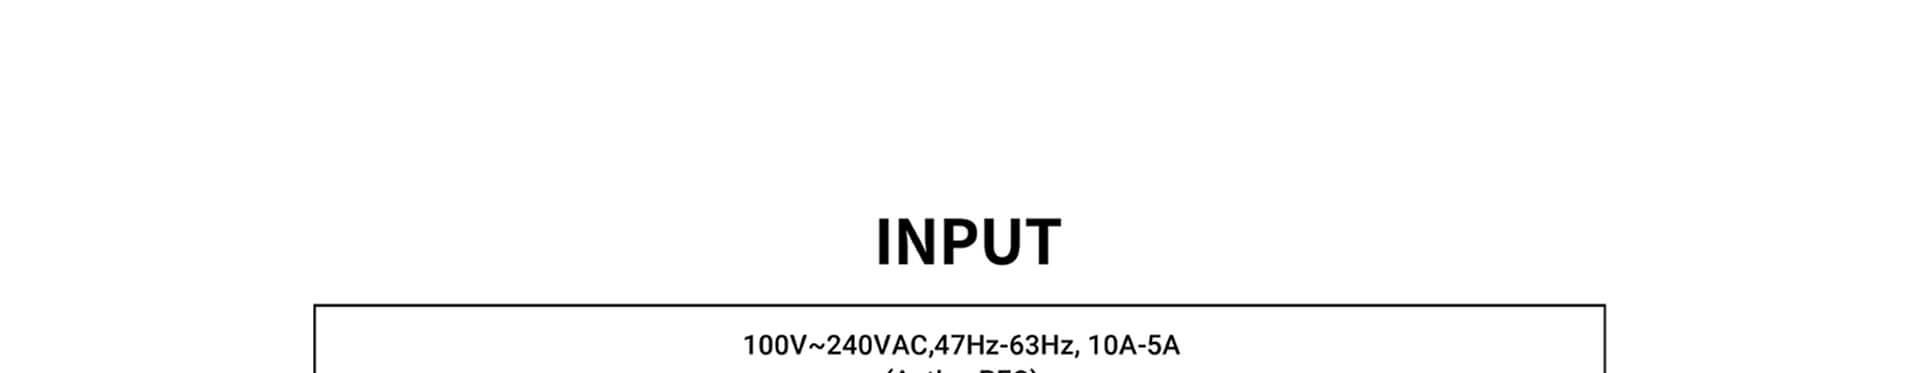 NeoECO-Modular-650-V2---antec_26.jpg